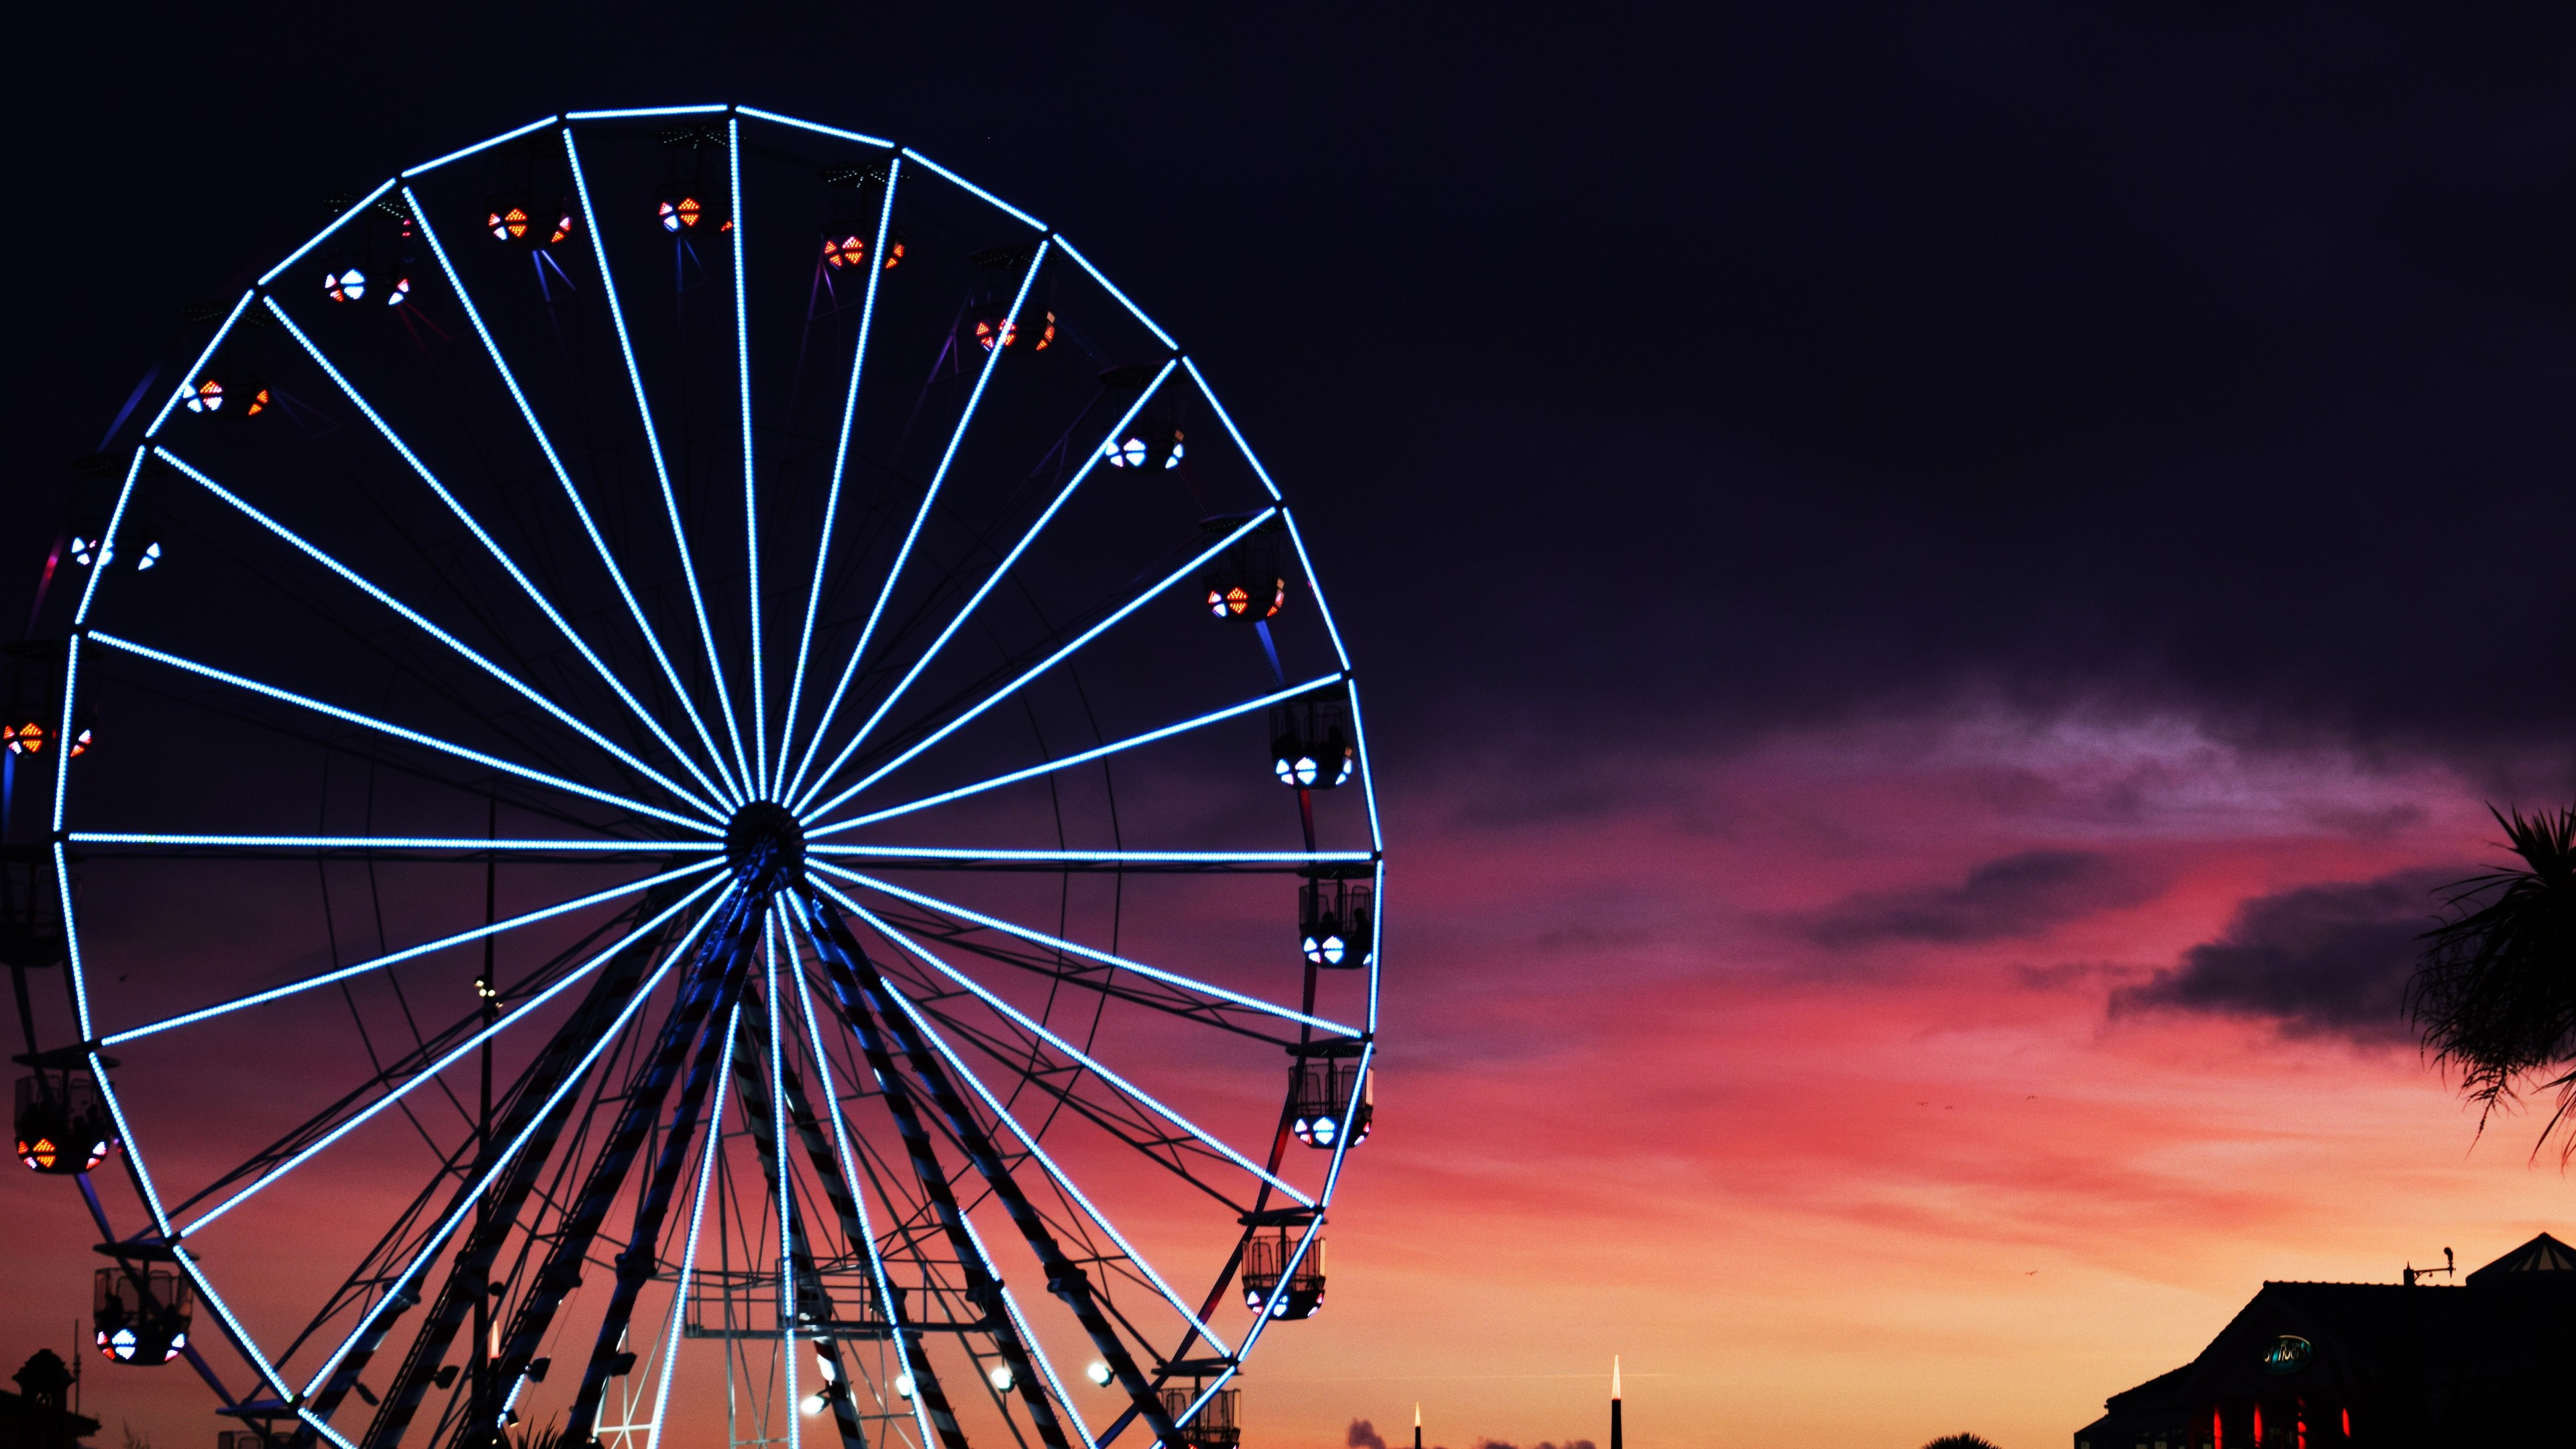 ferris wheel sunset clouds 4k 1540135754 - Ferris Wheel Sunset Clouds 4k - world wallpapers, sunset wallpapers, london wallpapers, hd-wallpapers, ferris wheel wallpapers, clouds wallpapers, 5k wallpapers, 4k-wallpapers